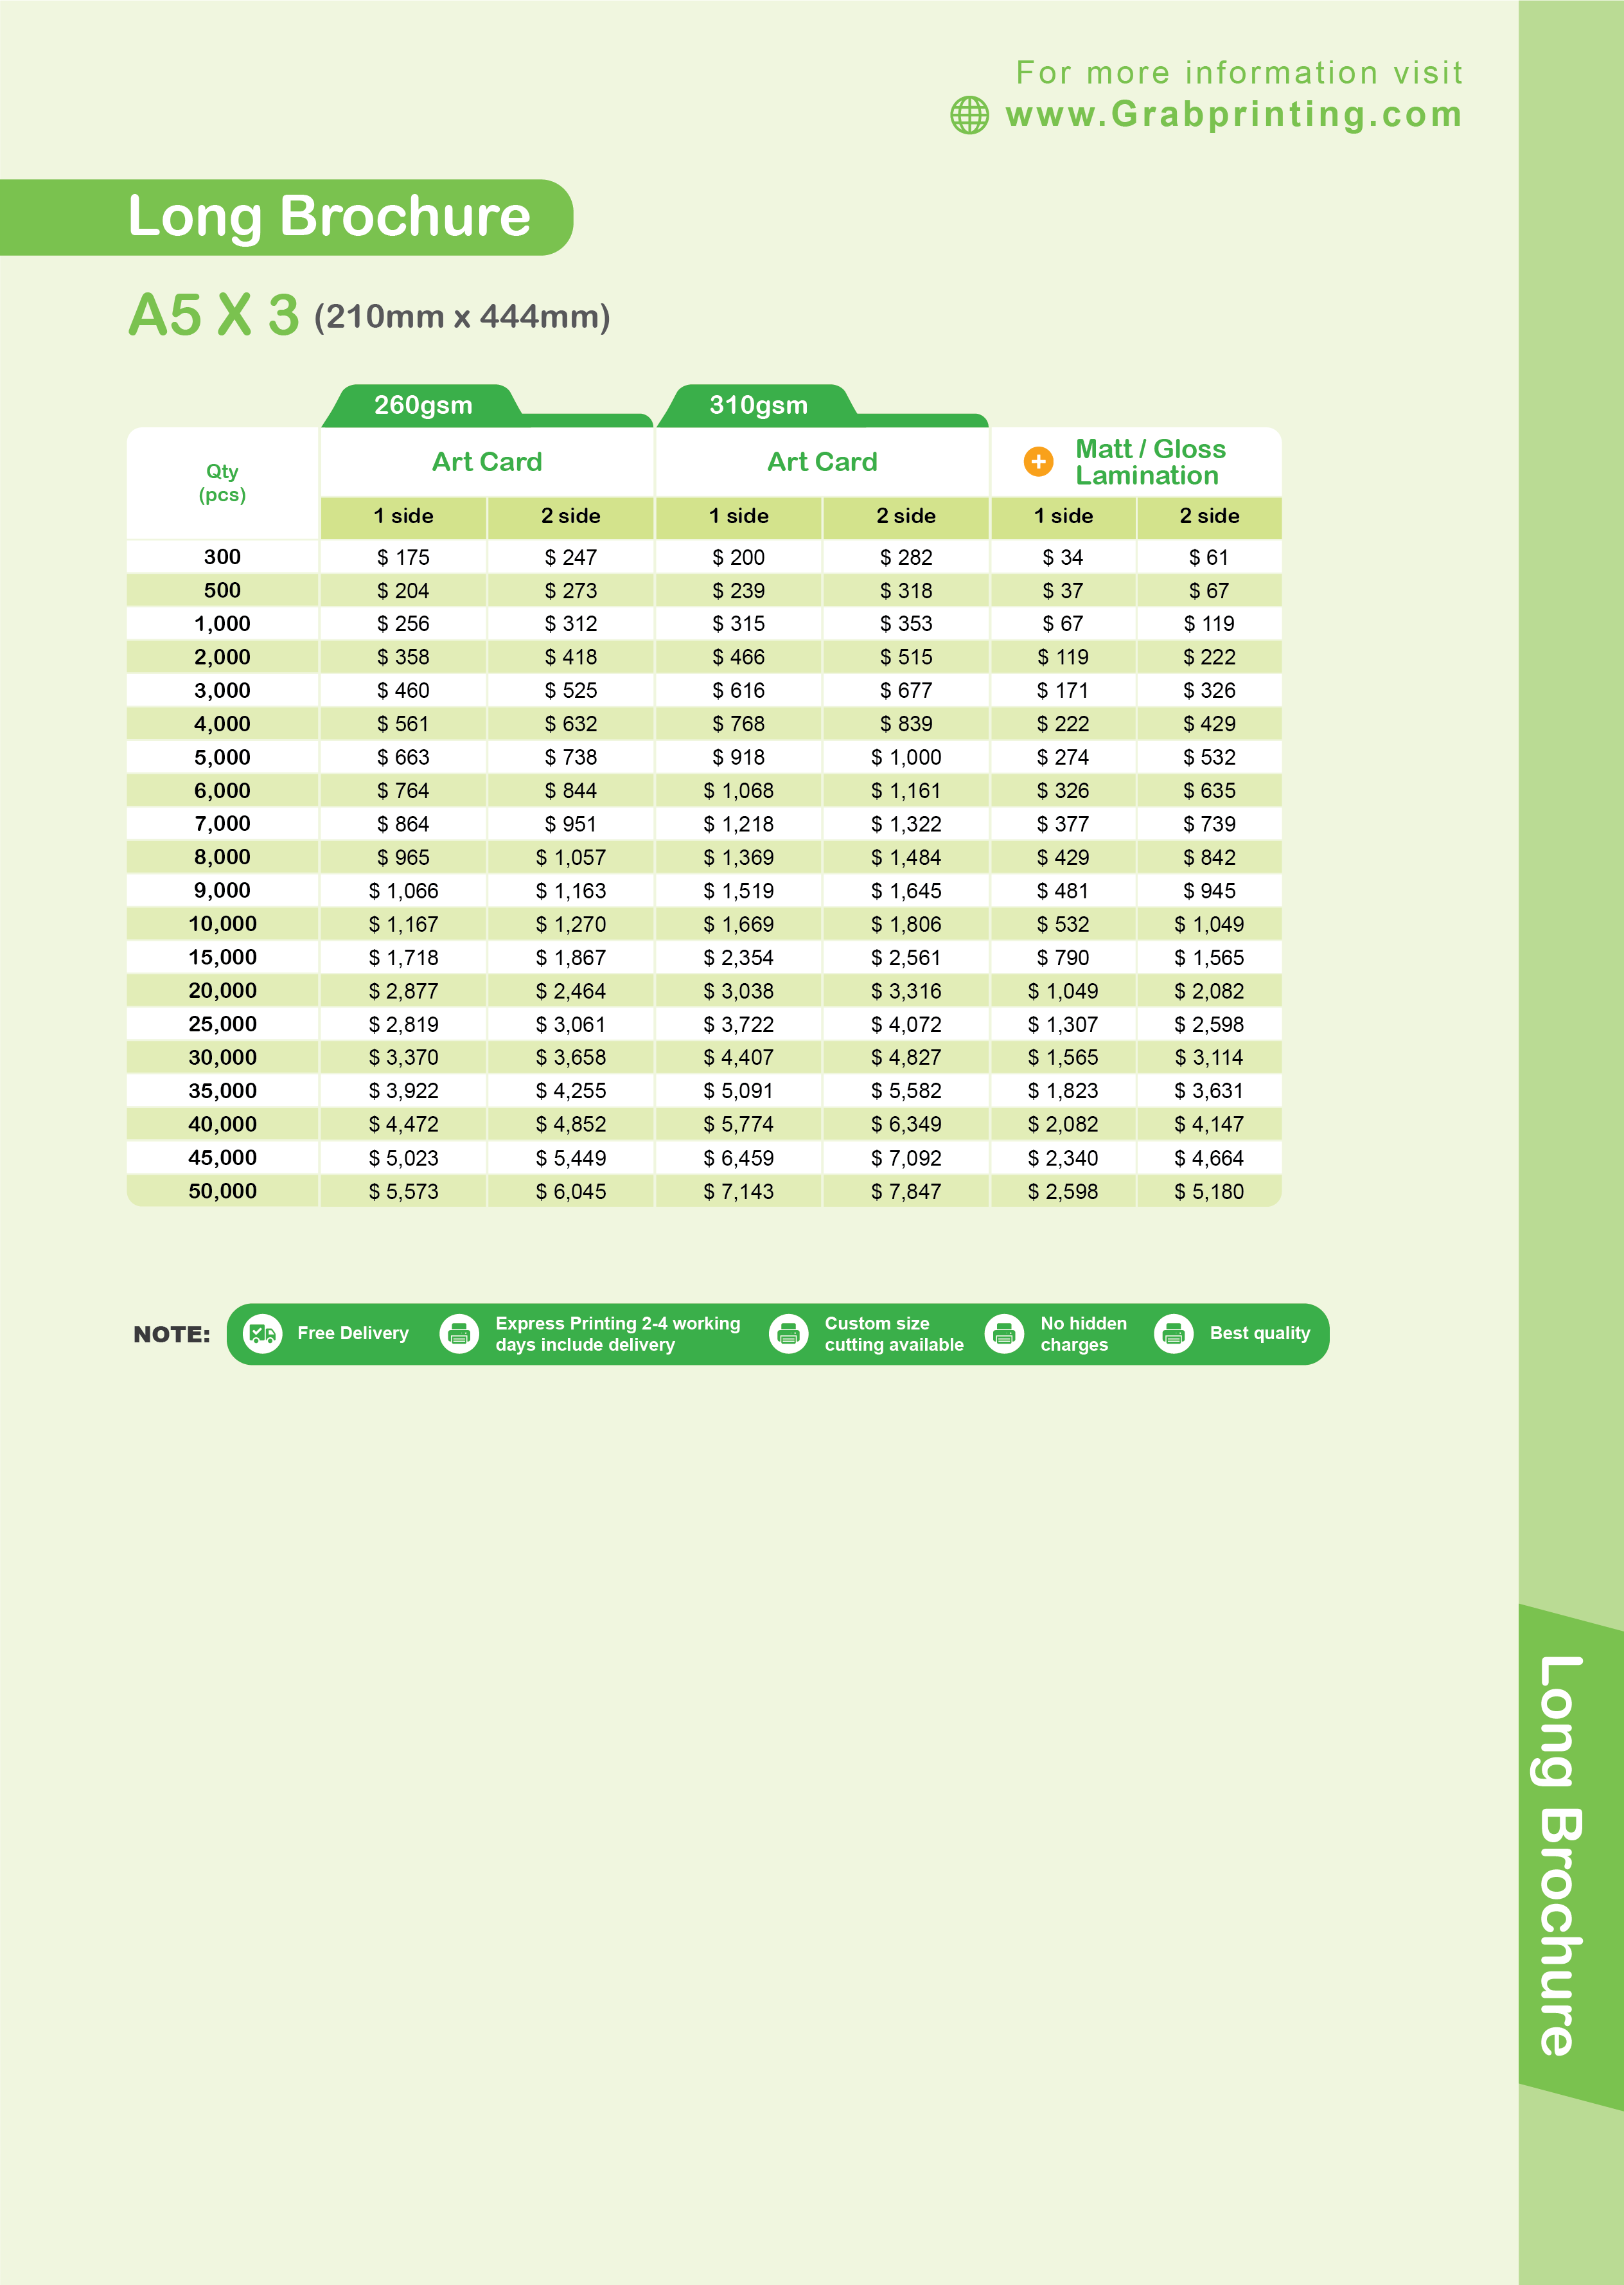 brochure printing Brochure Printing Long Brochure A5 x 3 Card Price List